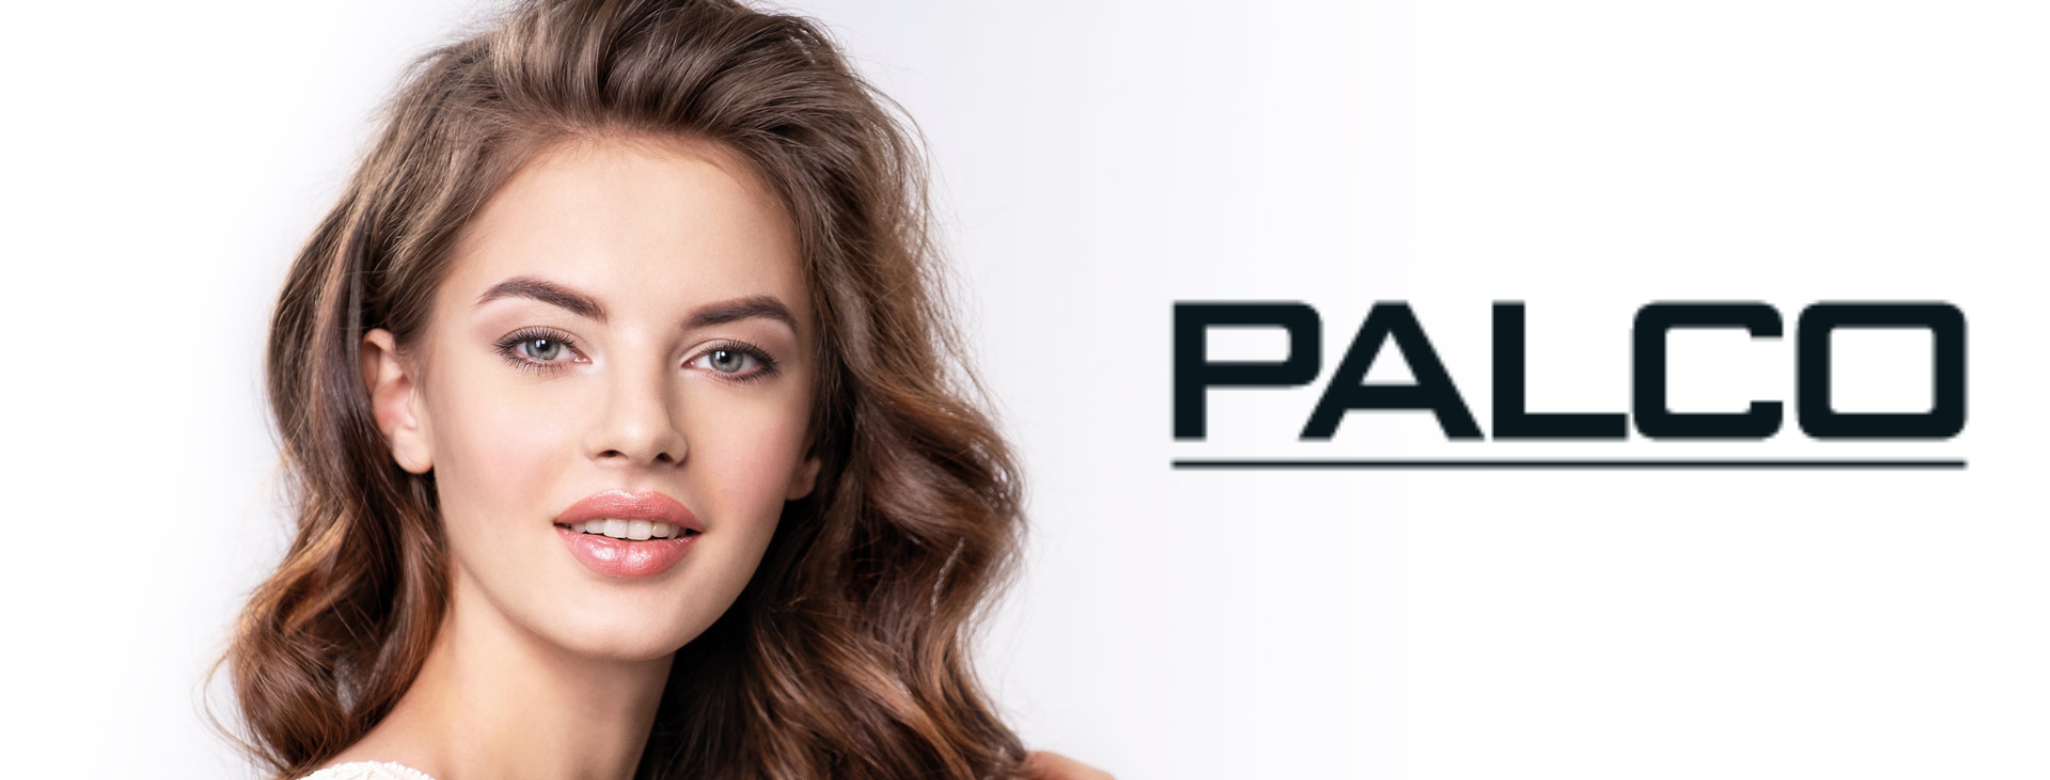 Palco Banner til brand side